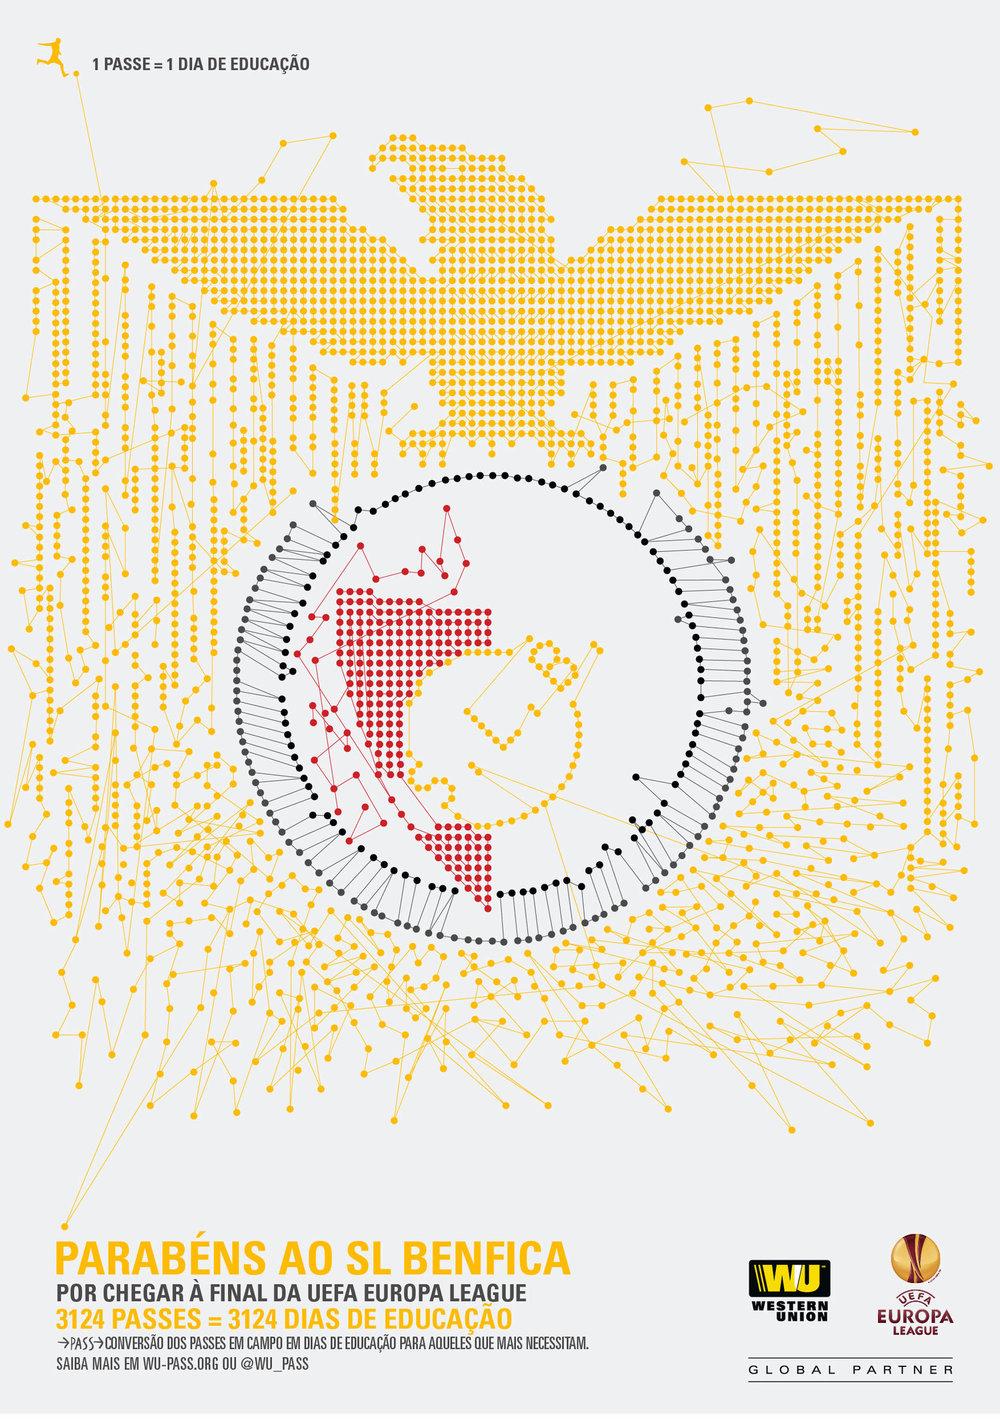 WU_UEL+Finalists_BENFICA+v5.jpg